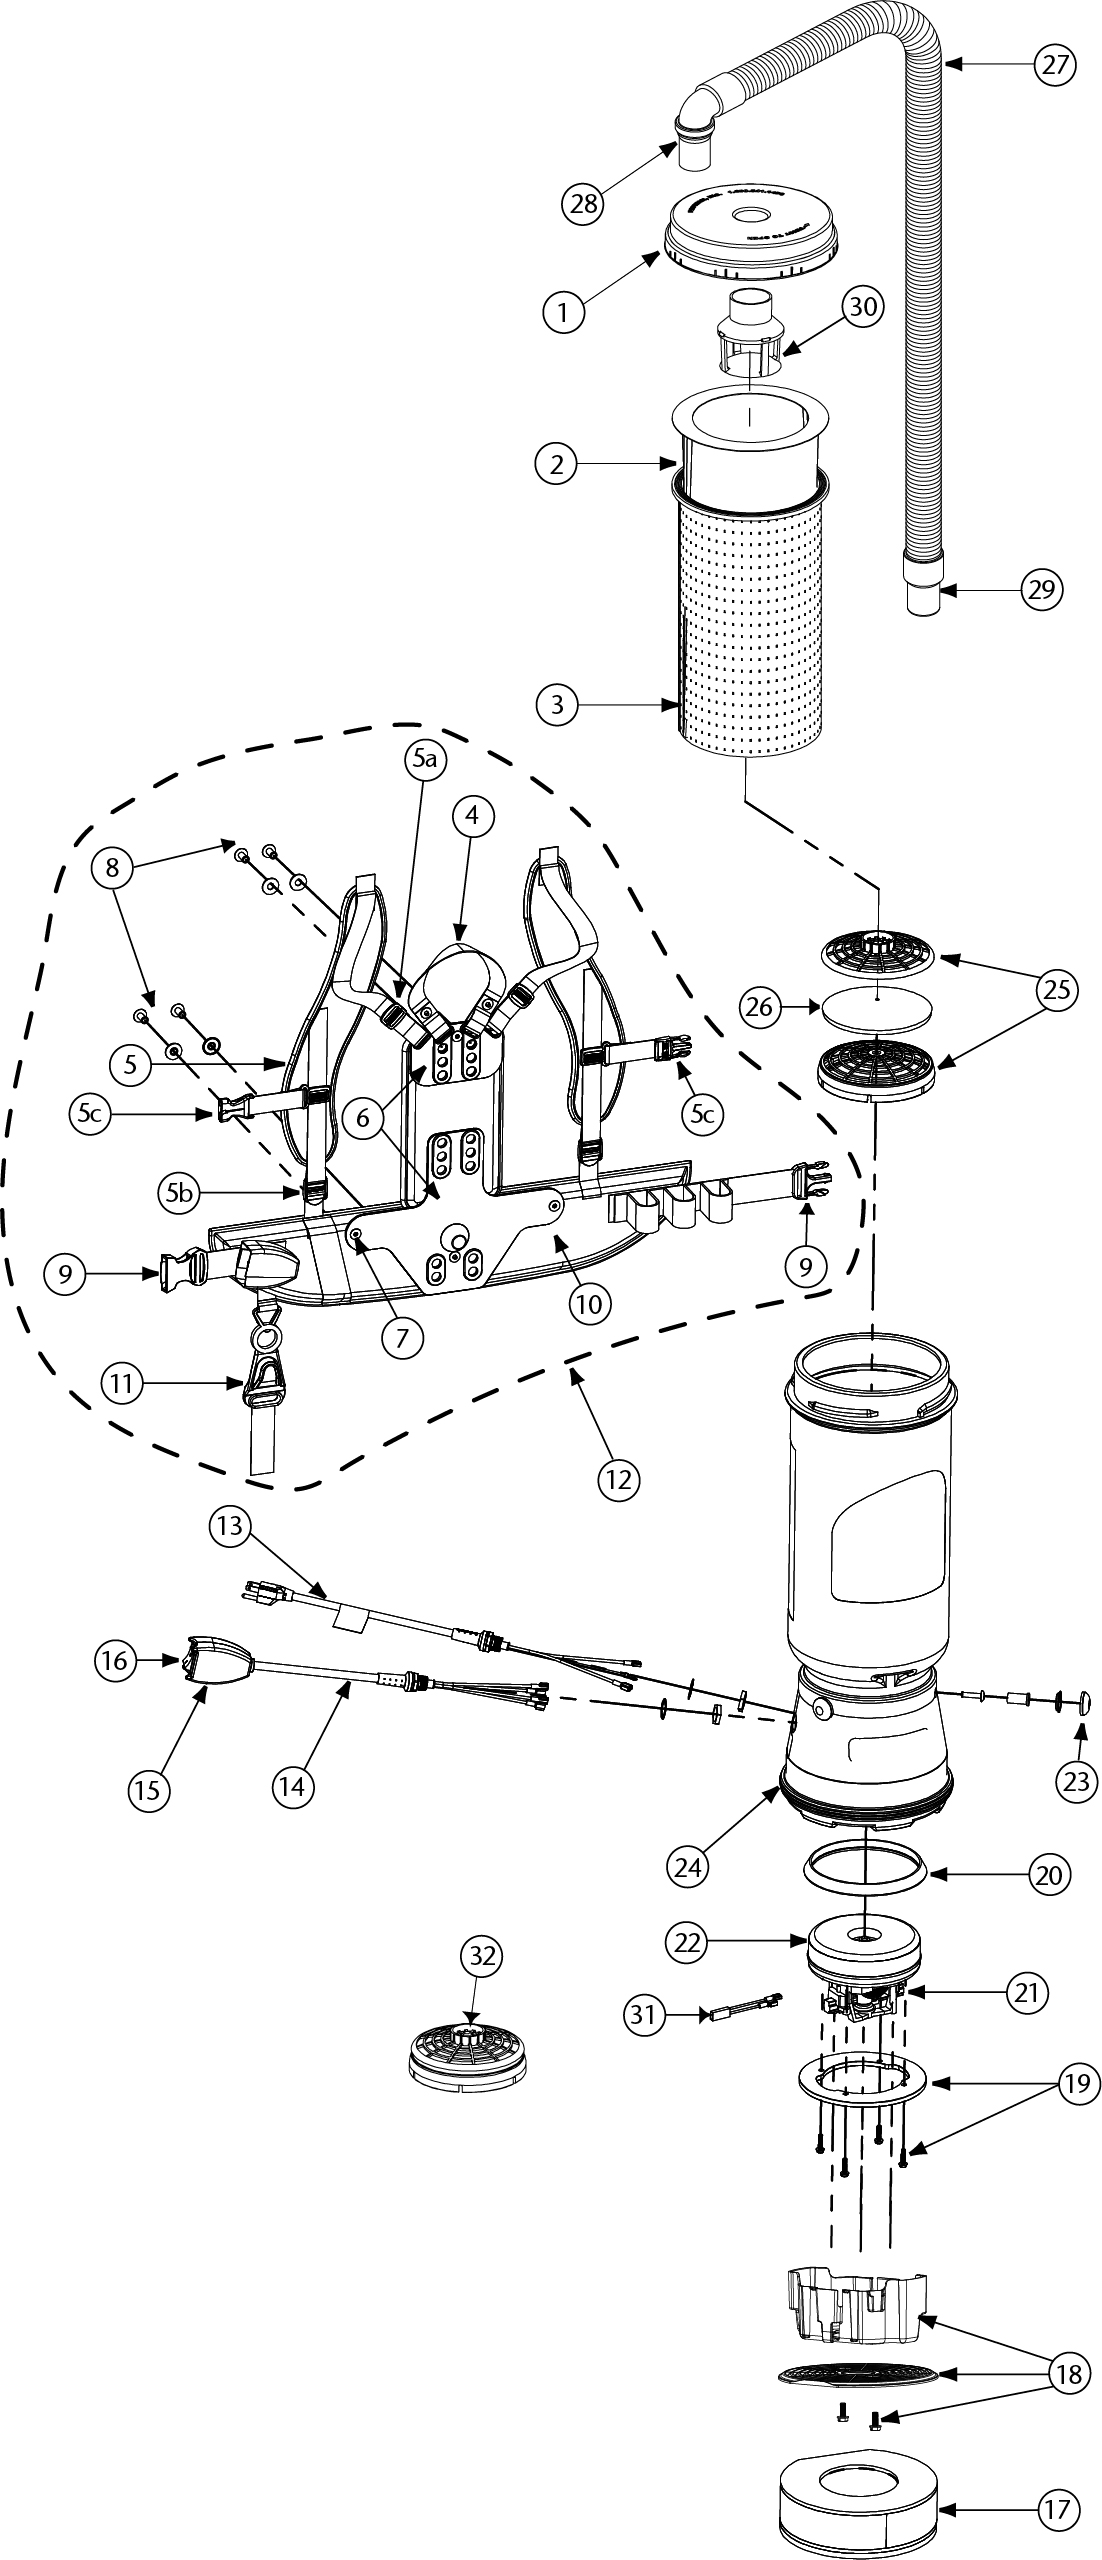 Wiring Diagram PDF: 13048 Wire Delco Alternator Wiring Diagram